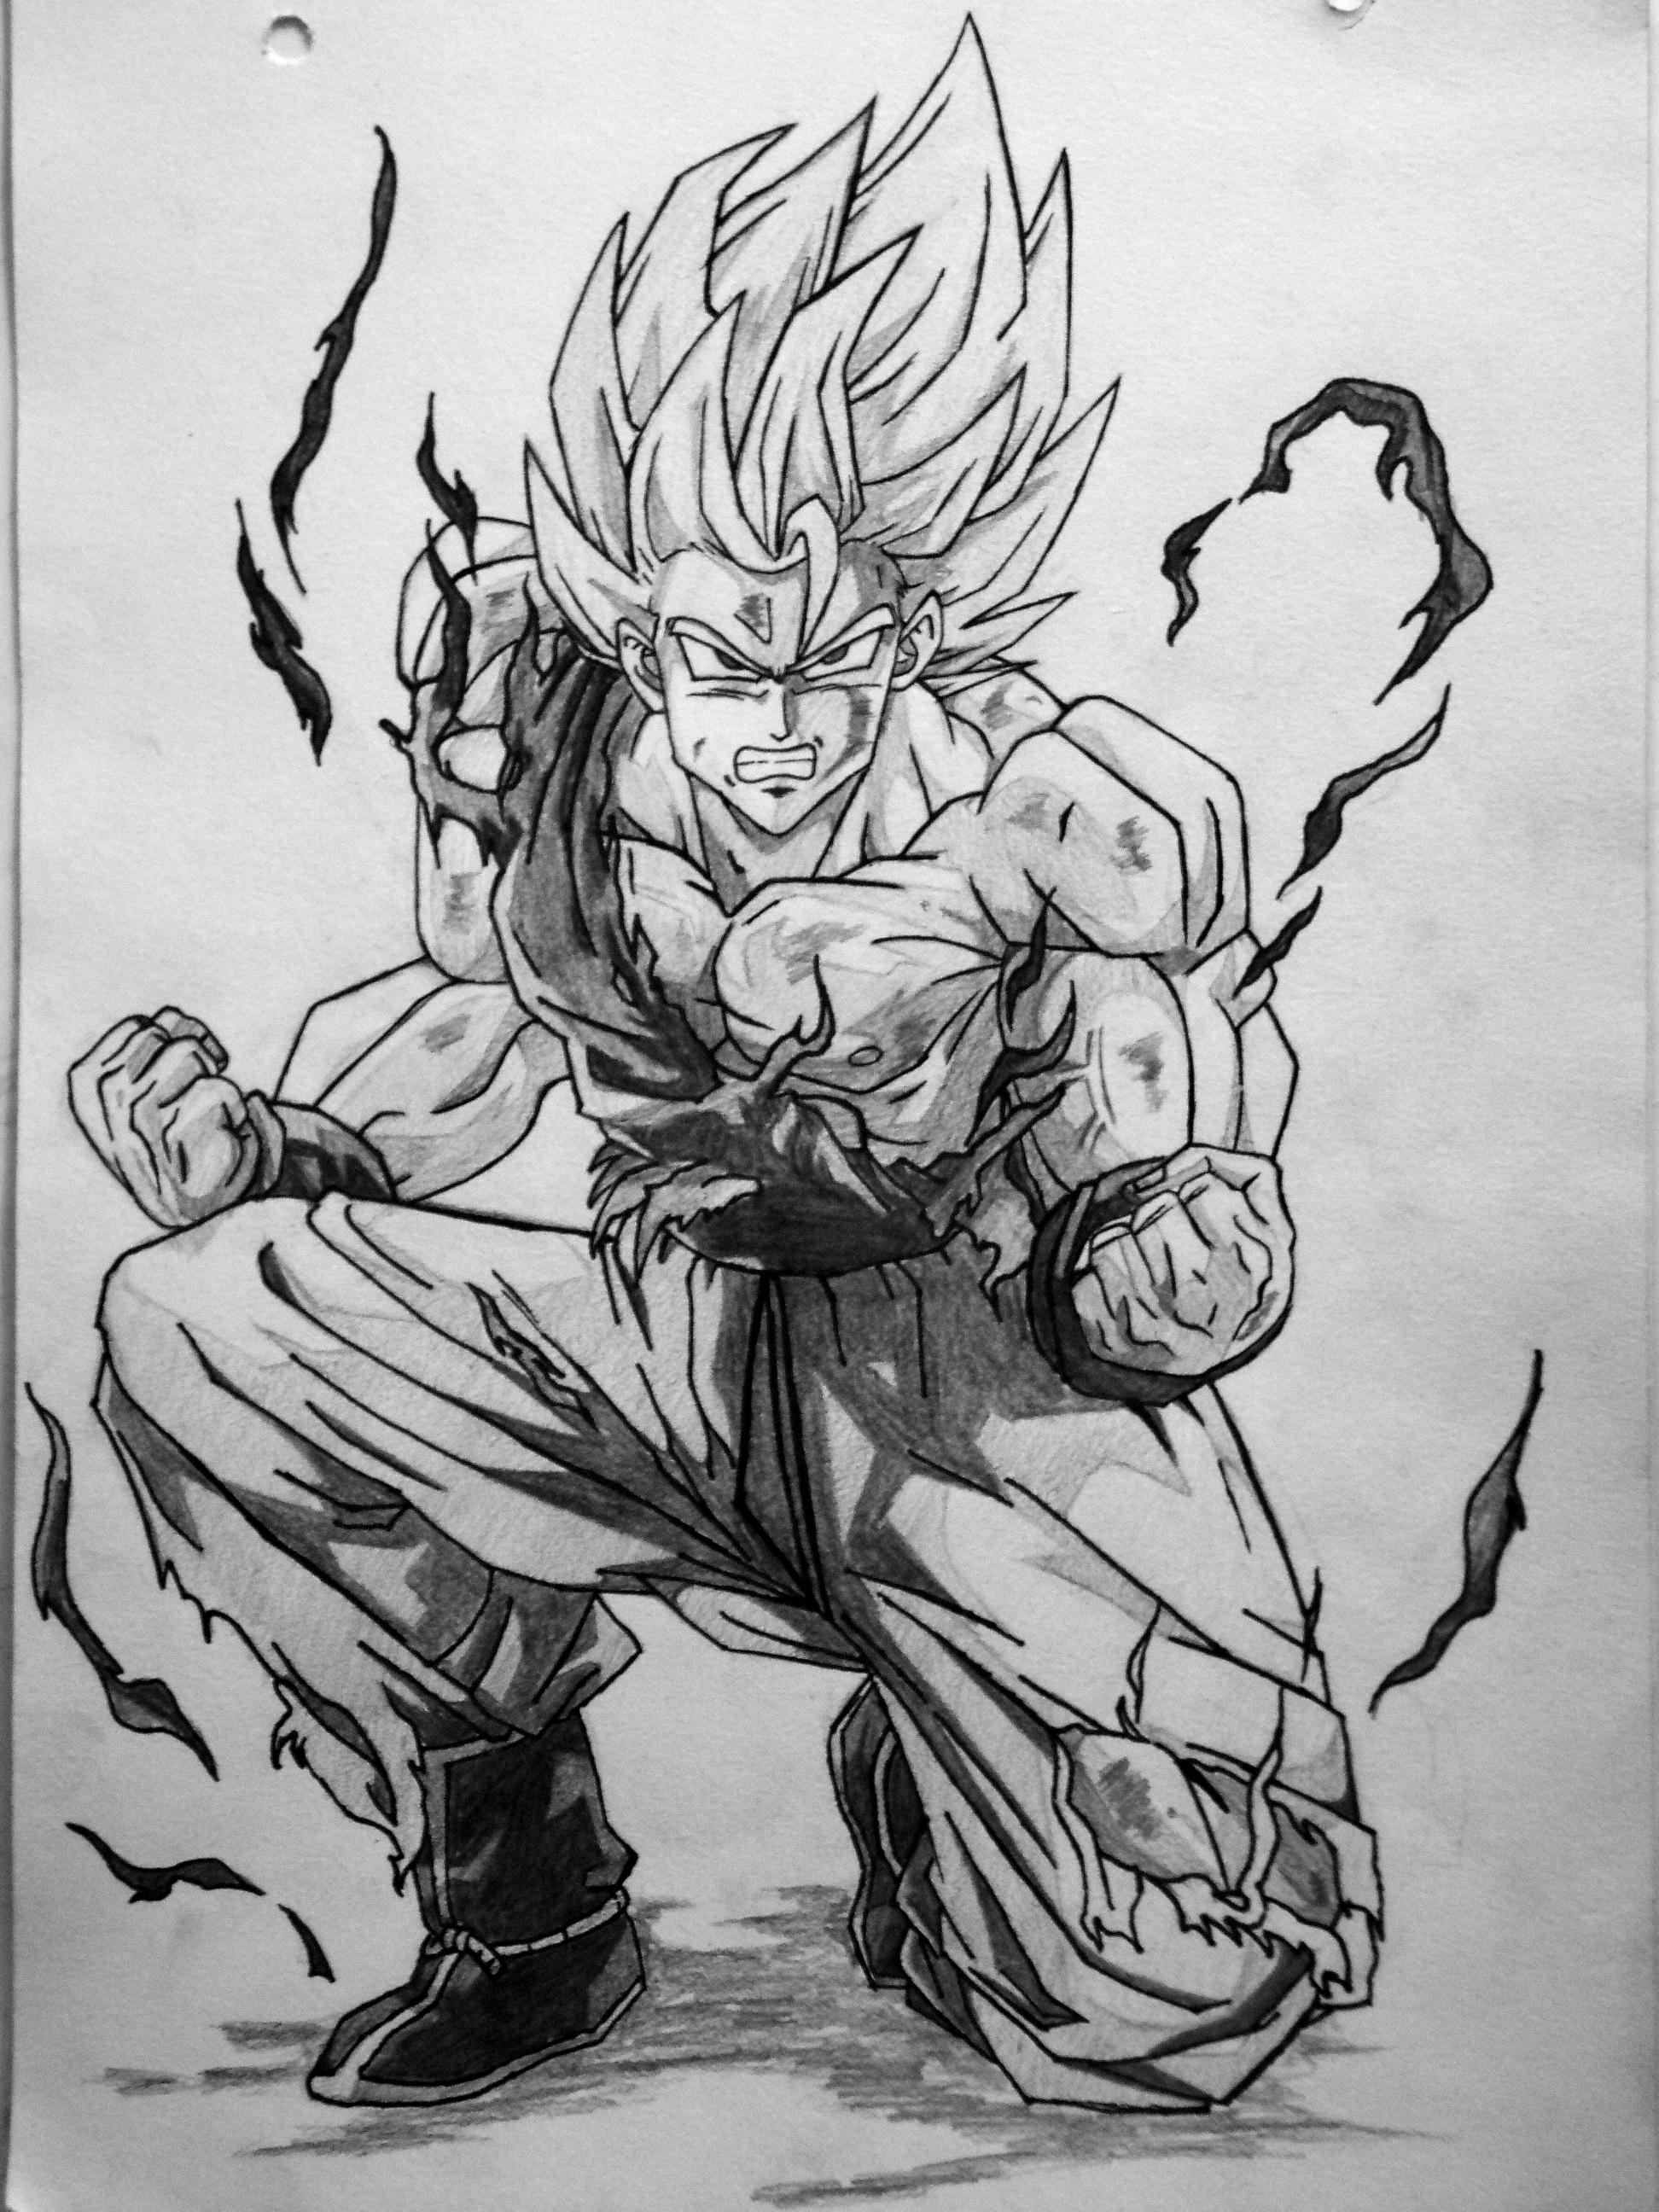 Goku Super Saiyan 1 by EckoSlime on DeviantArt